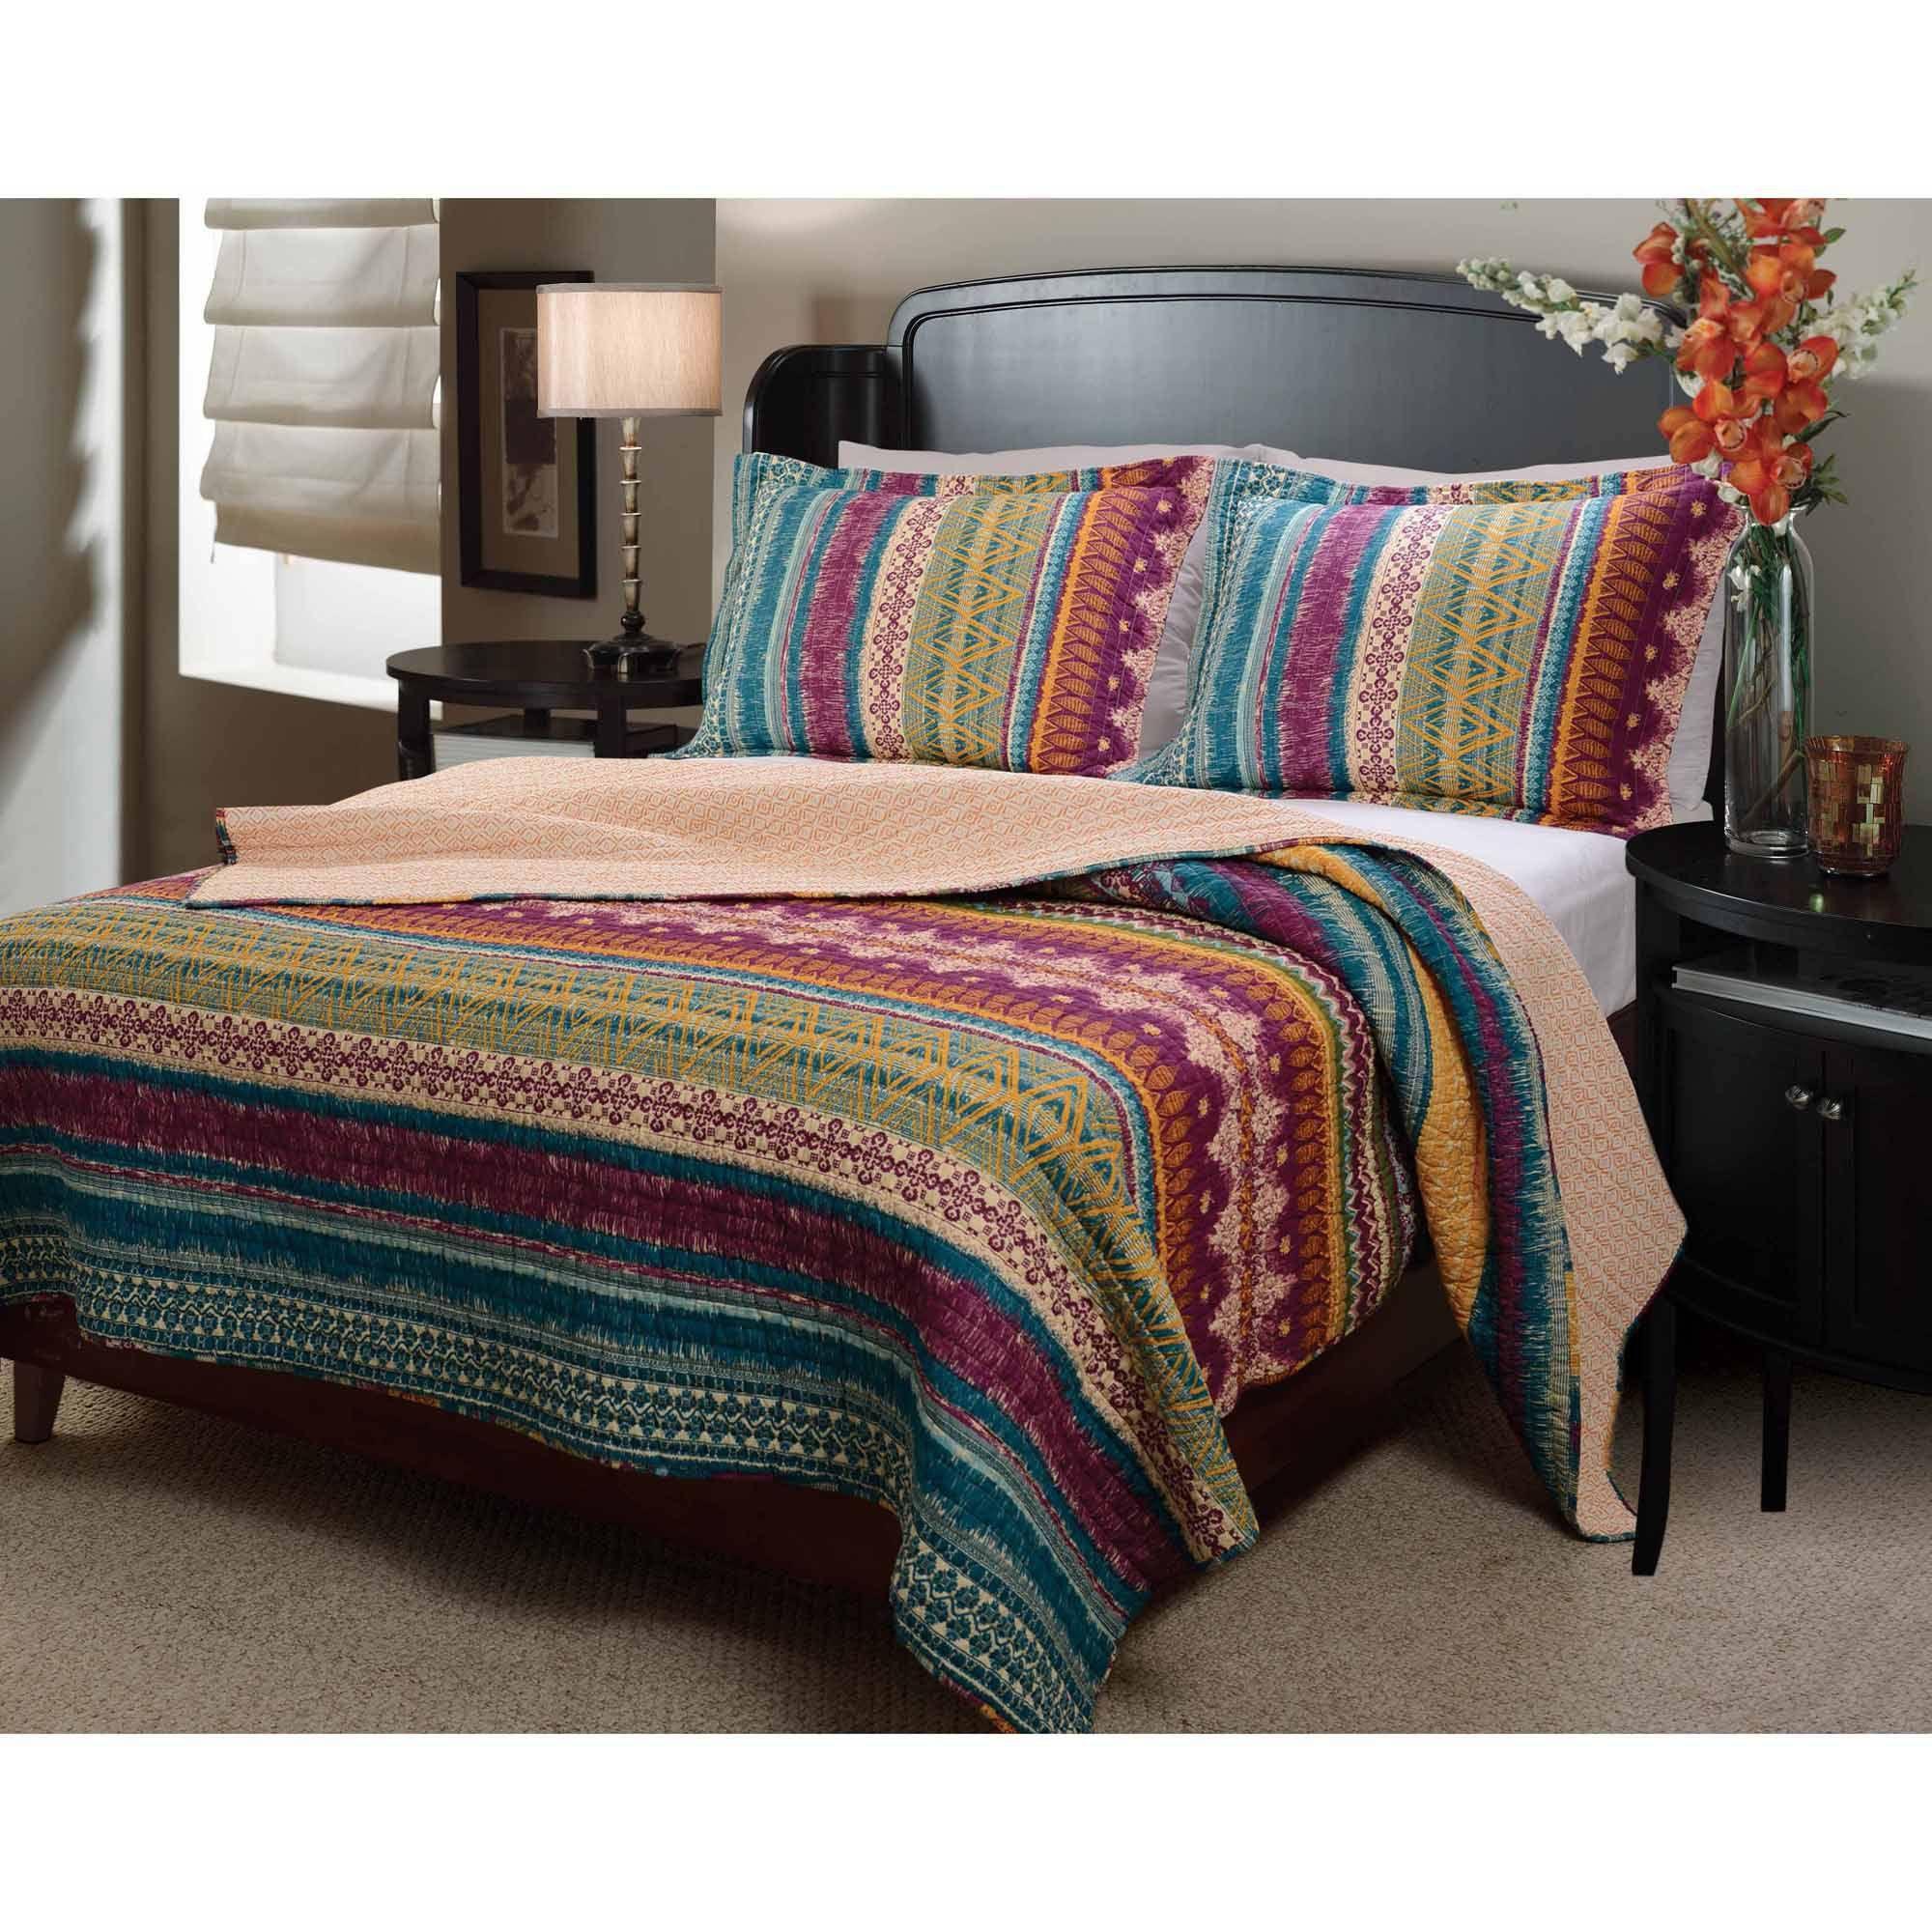 Walmart Bedroom Sets Pleasing Global Trends Santa Fe Bedding Quilt Set  Walmart  Florida Design Ideas